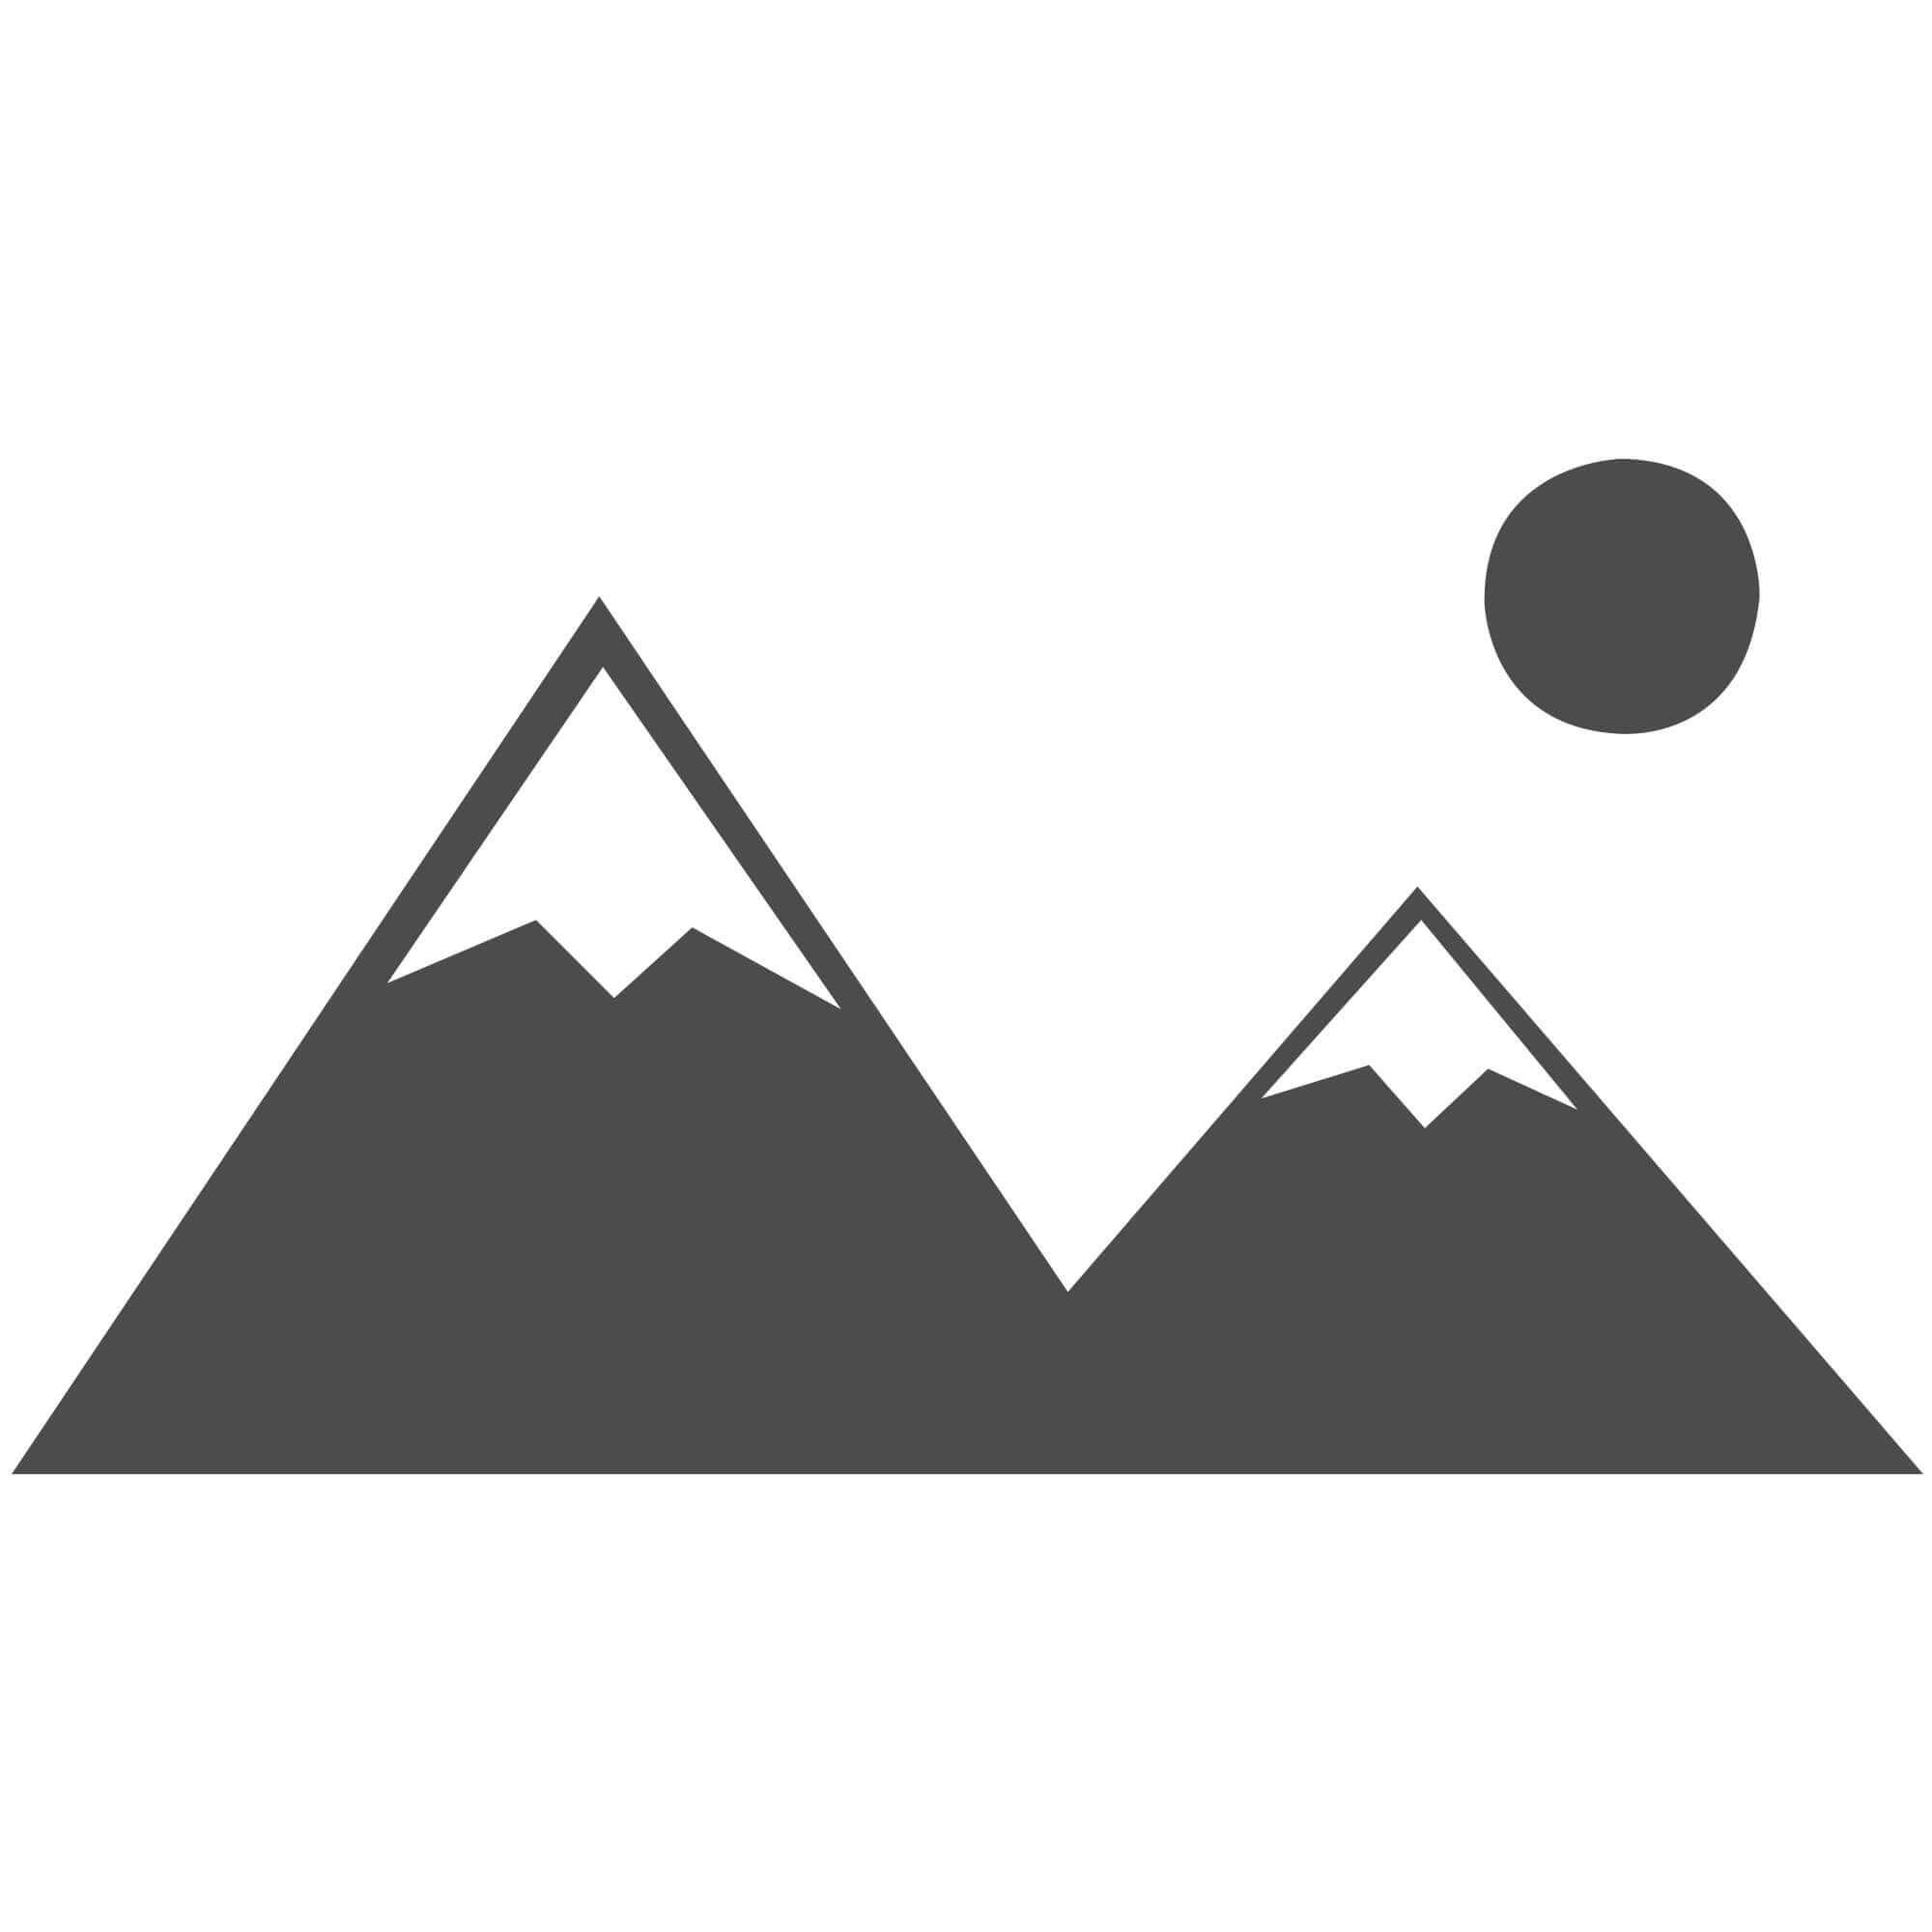 Persian Shiraz Tribal Wool Rug - 162 x 218 cm